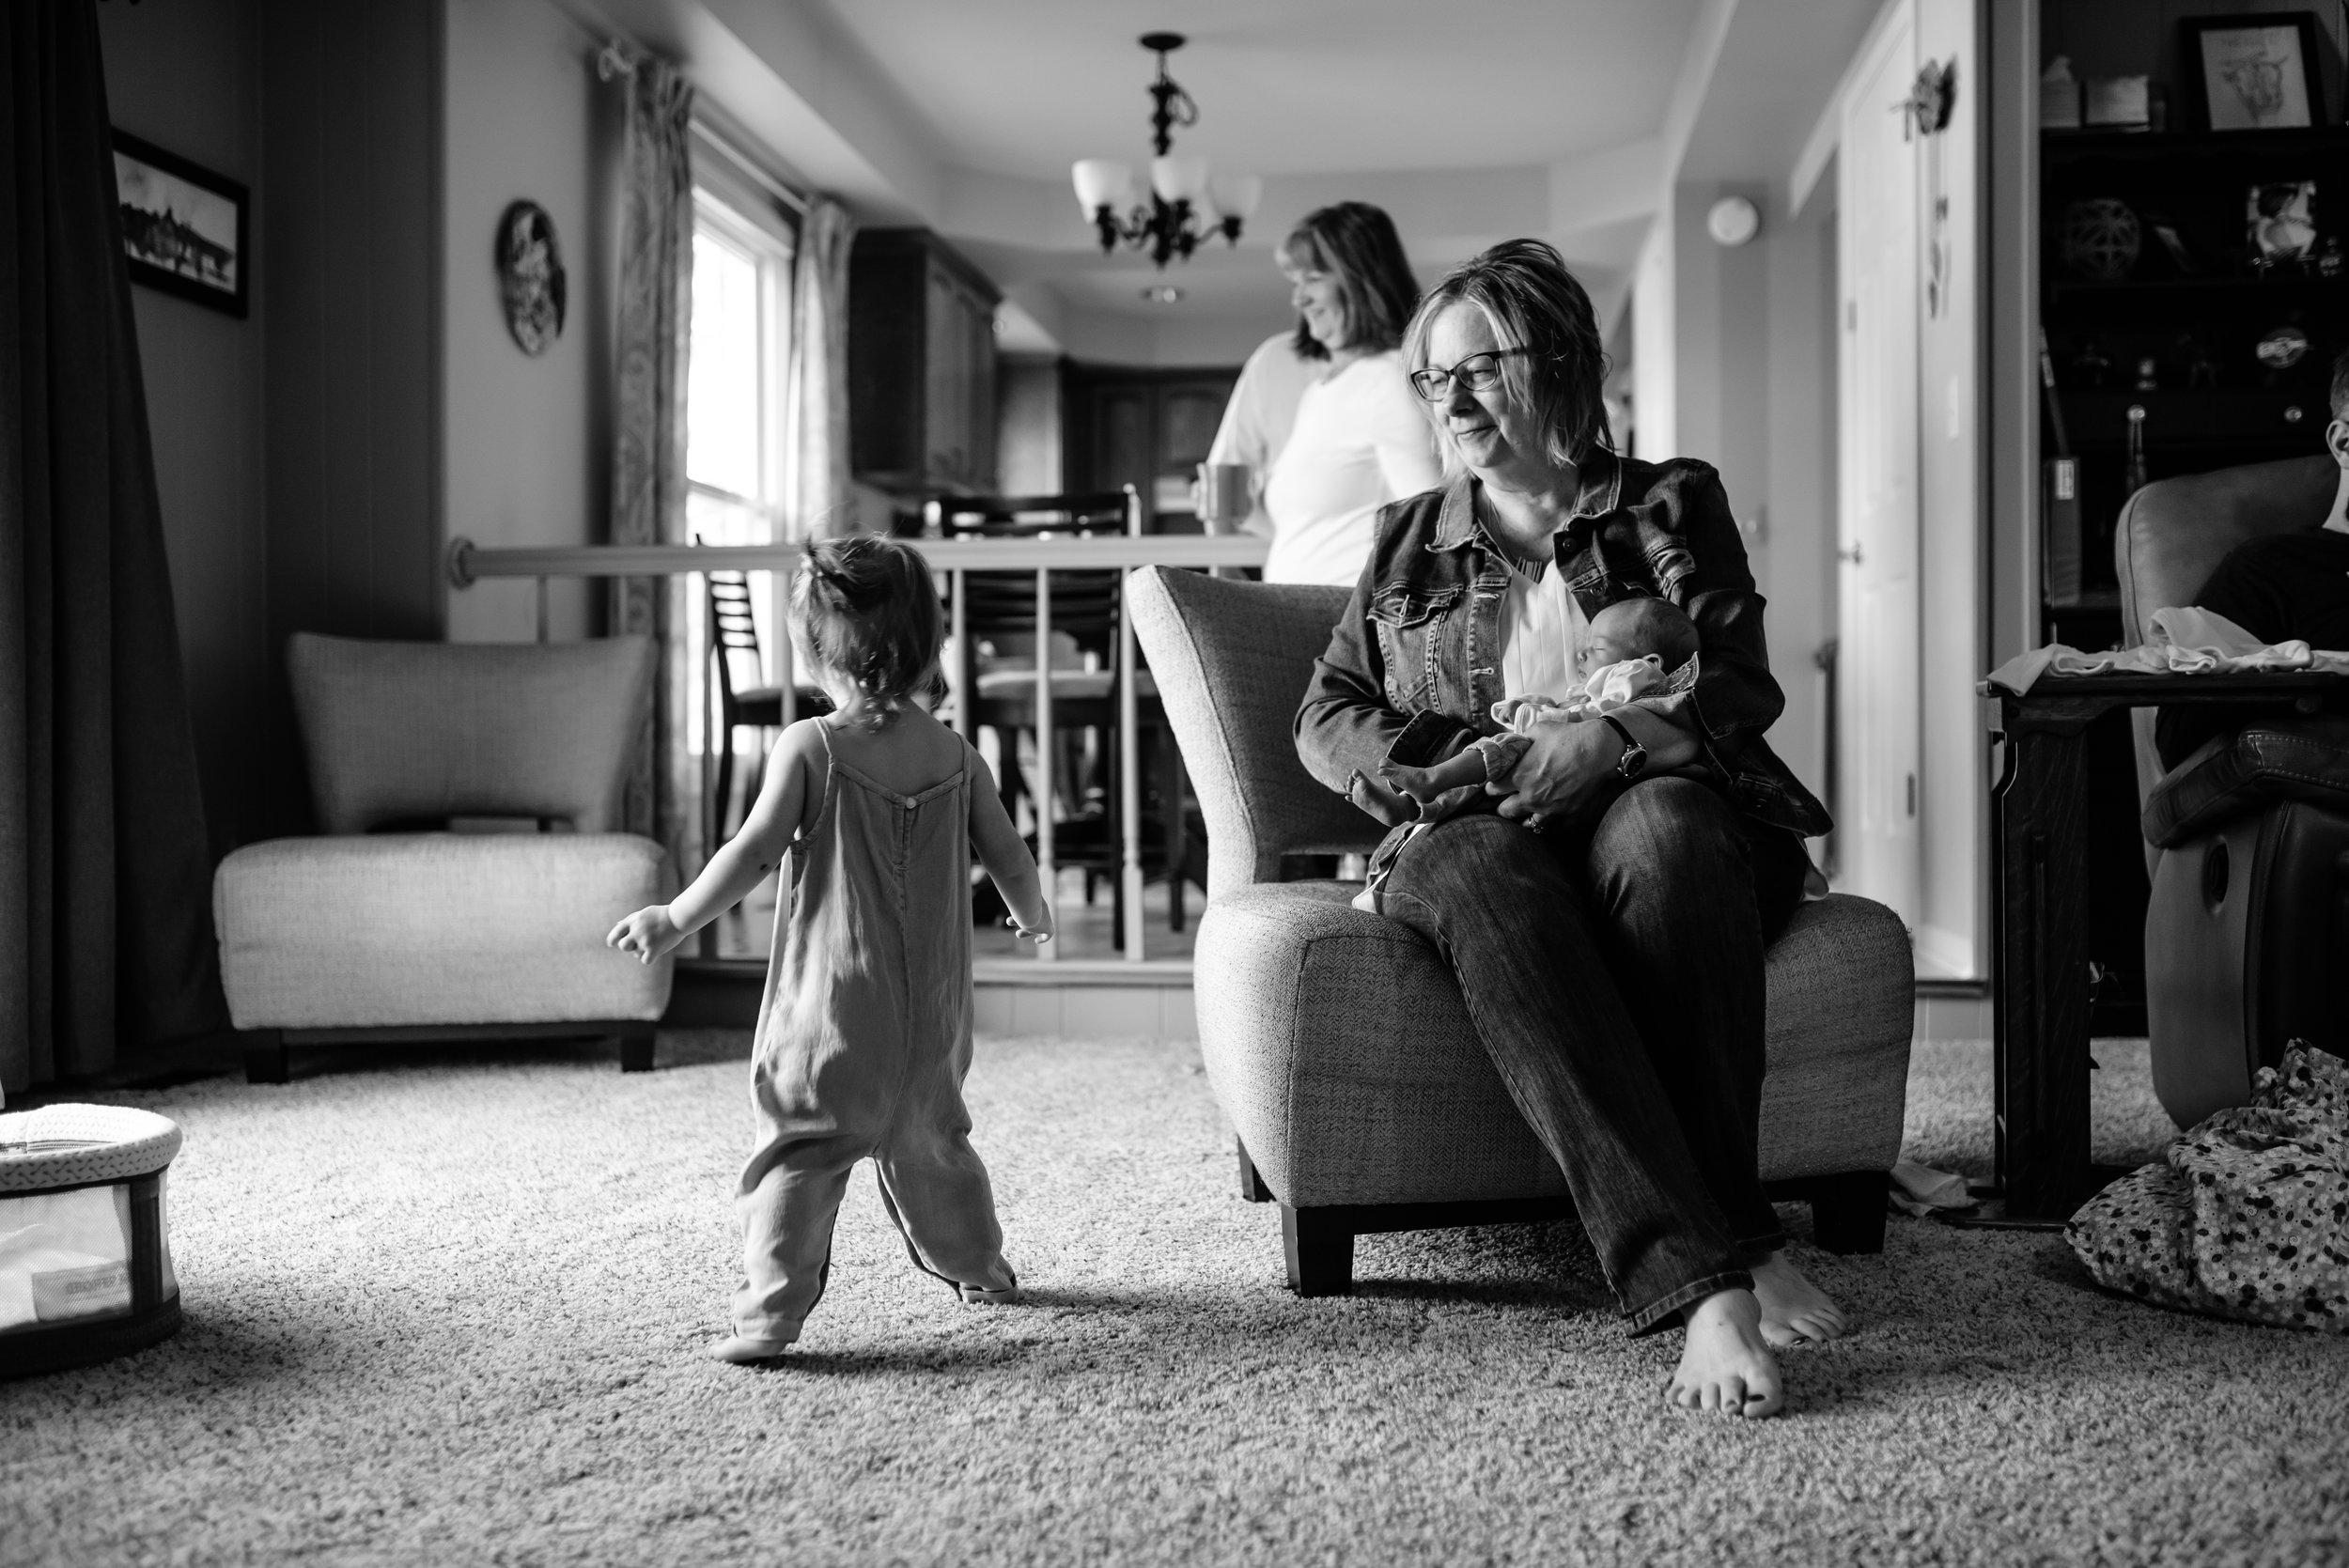 Grandma holds baby and watches girl dance